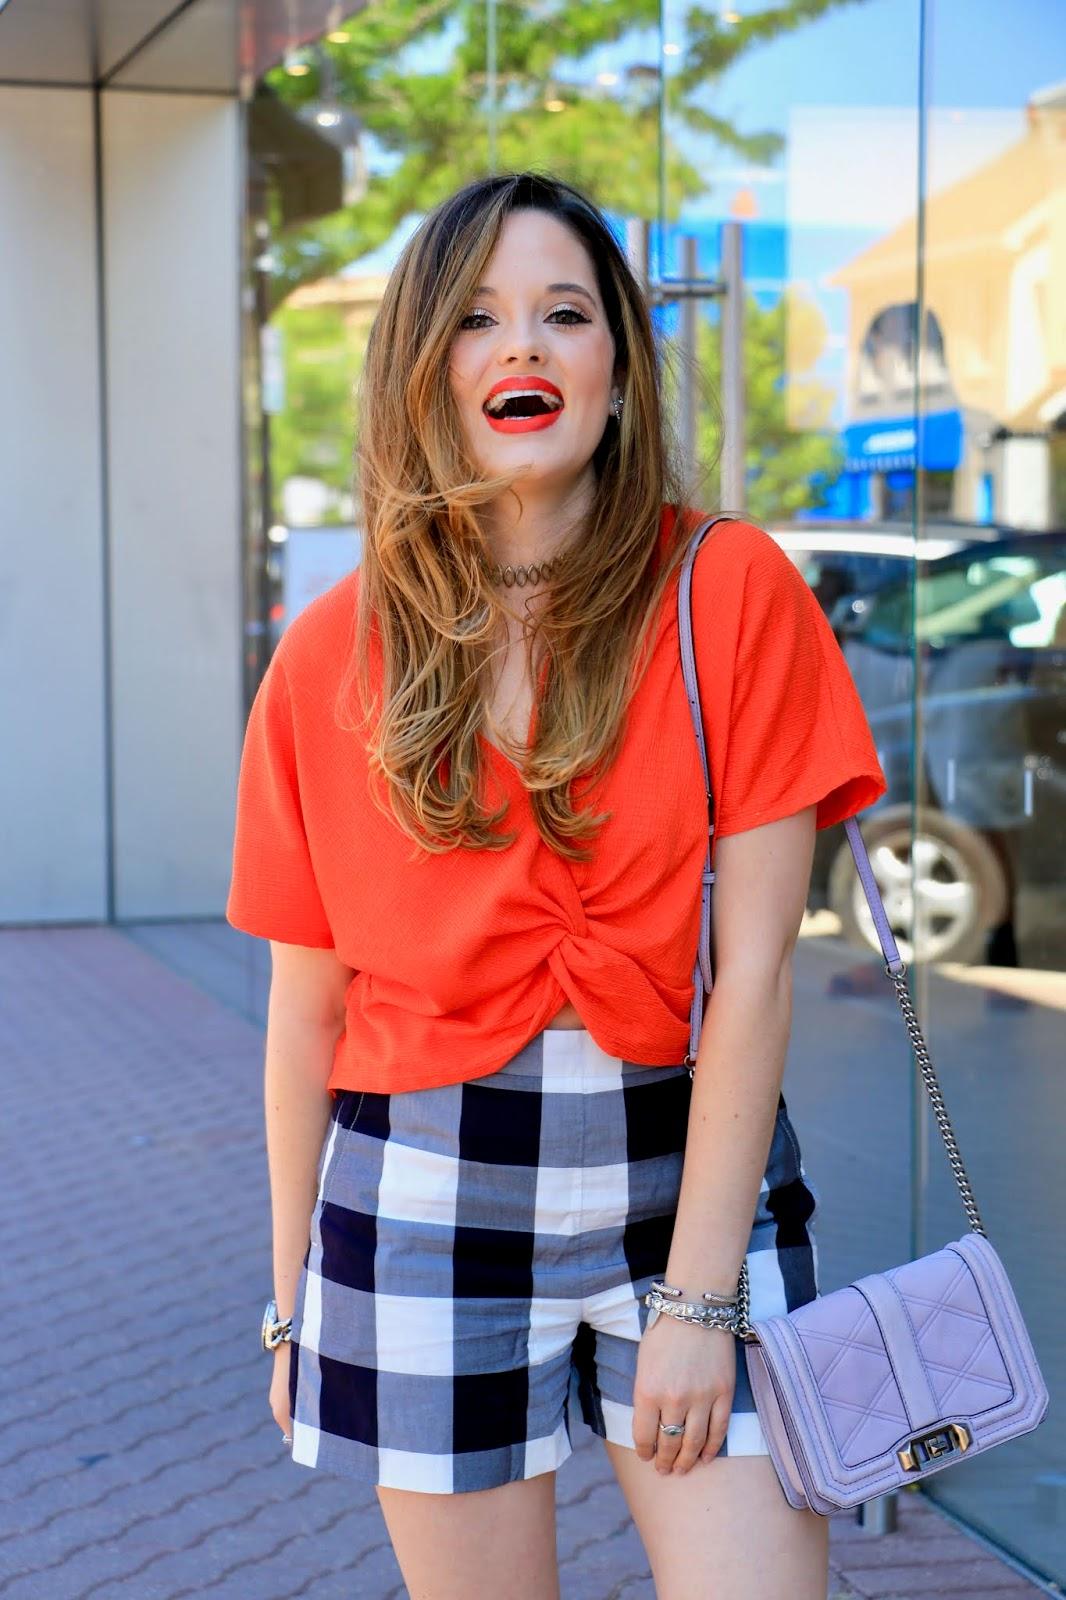 Nyc fashion blogger of Kat's Fashion Fix, Kathleen Harper, wearing high-waisted plaid shorts